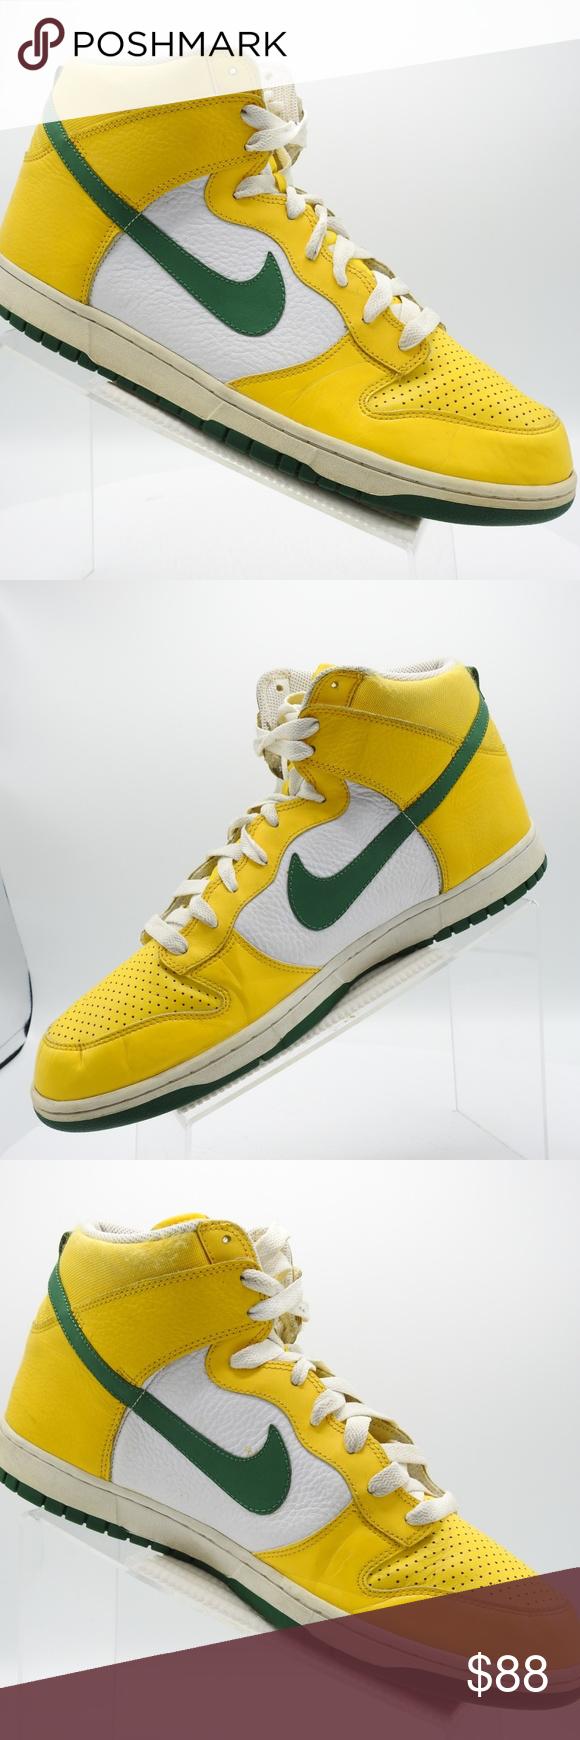 buy popular 22a5c f282f Nike Dunk High Brazil 317982-731 Sz 14 Mens Shoes Nike Dunk High Brazil  317982